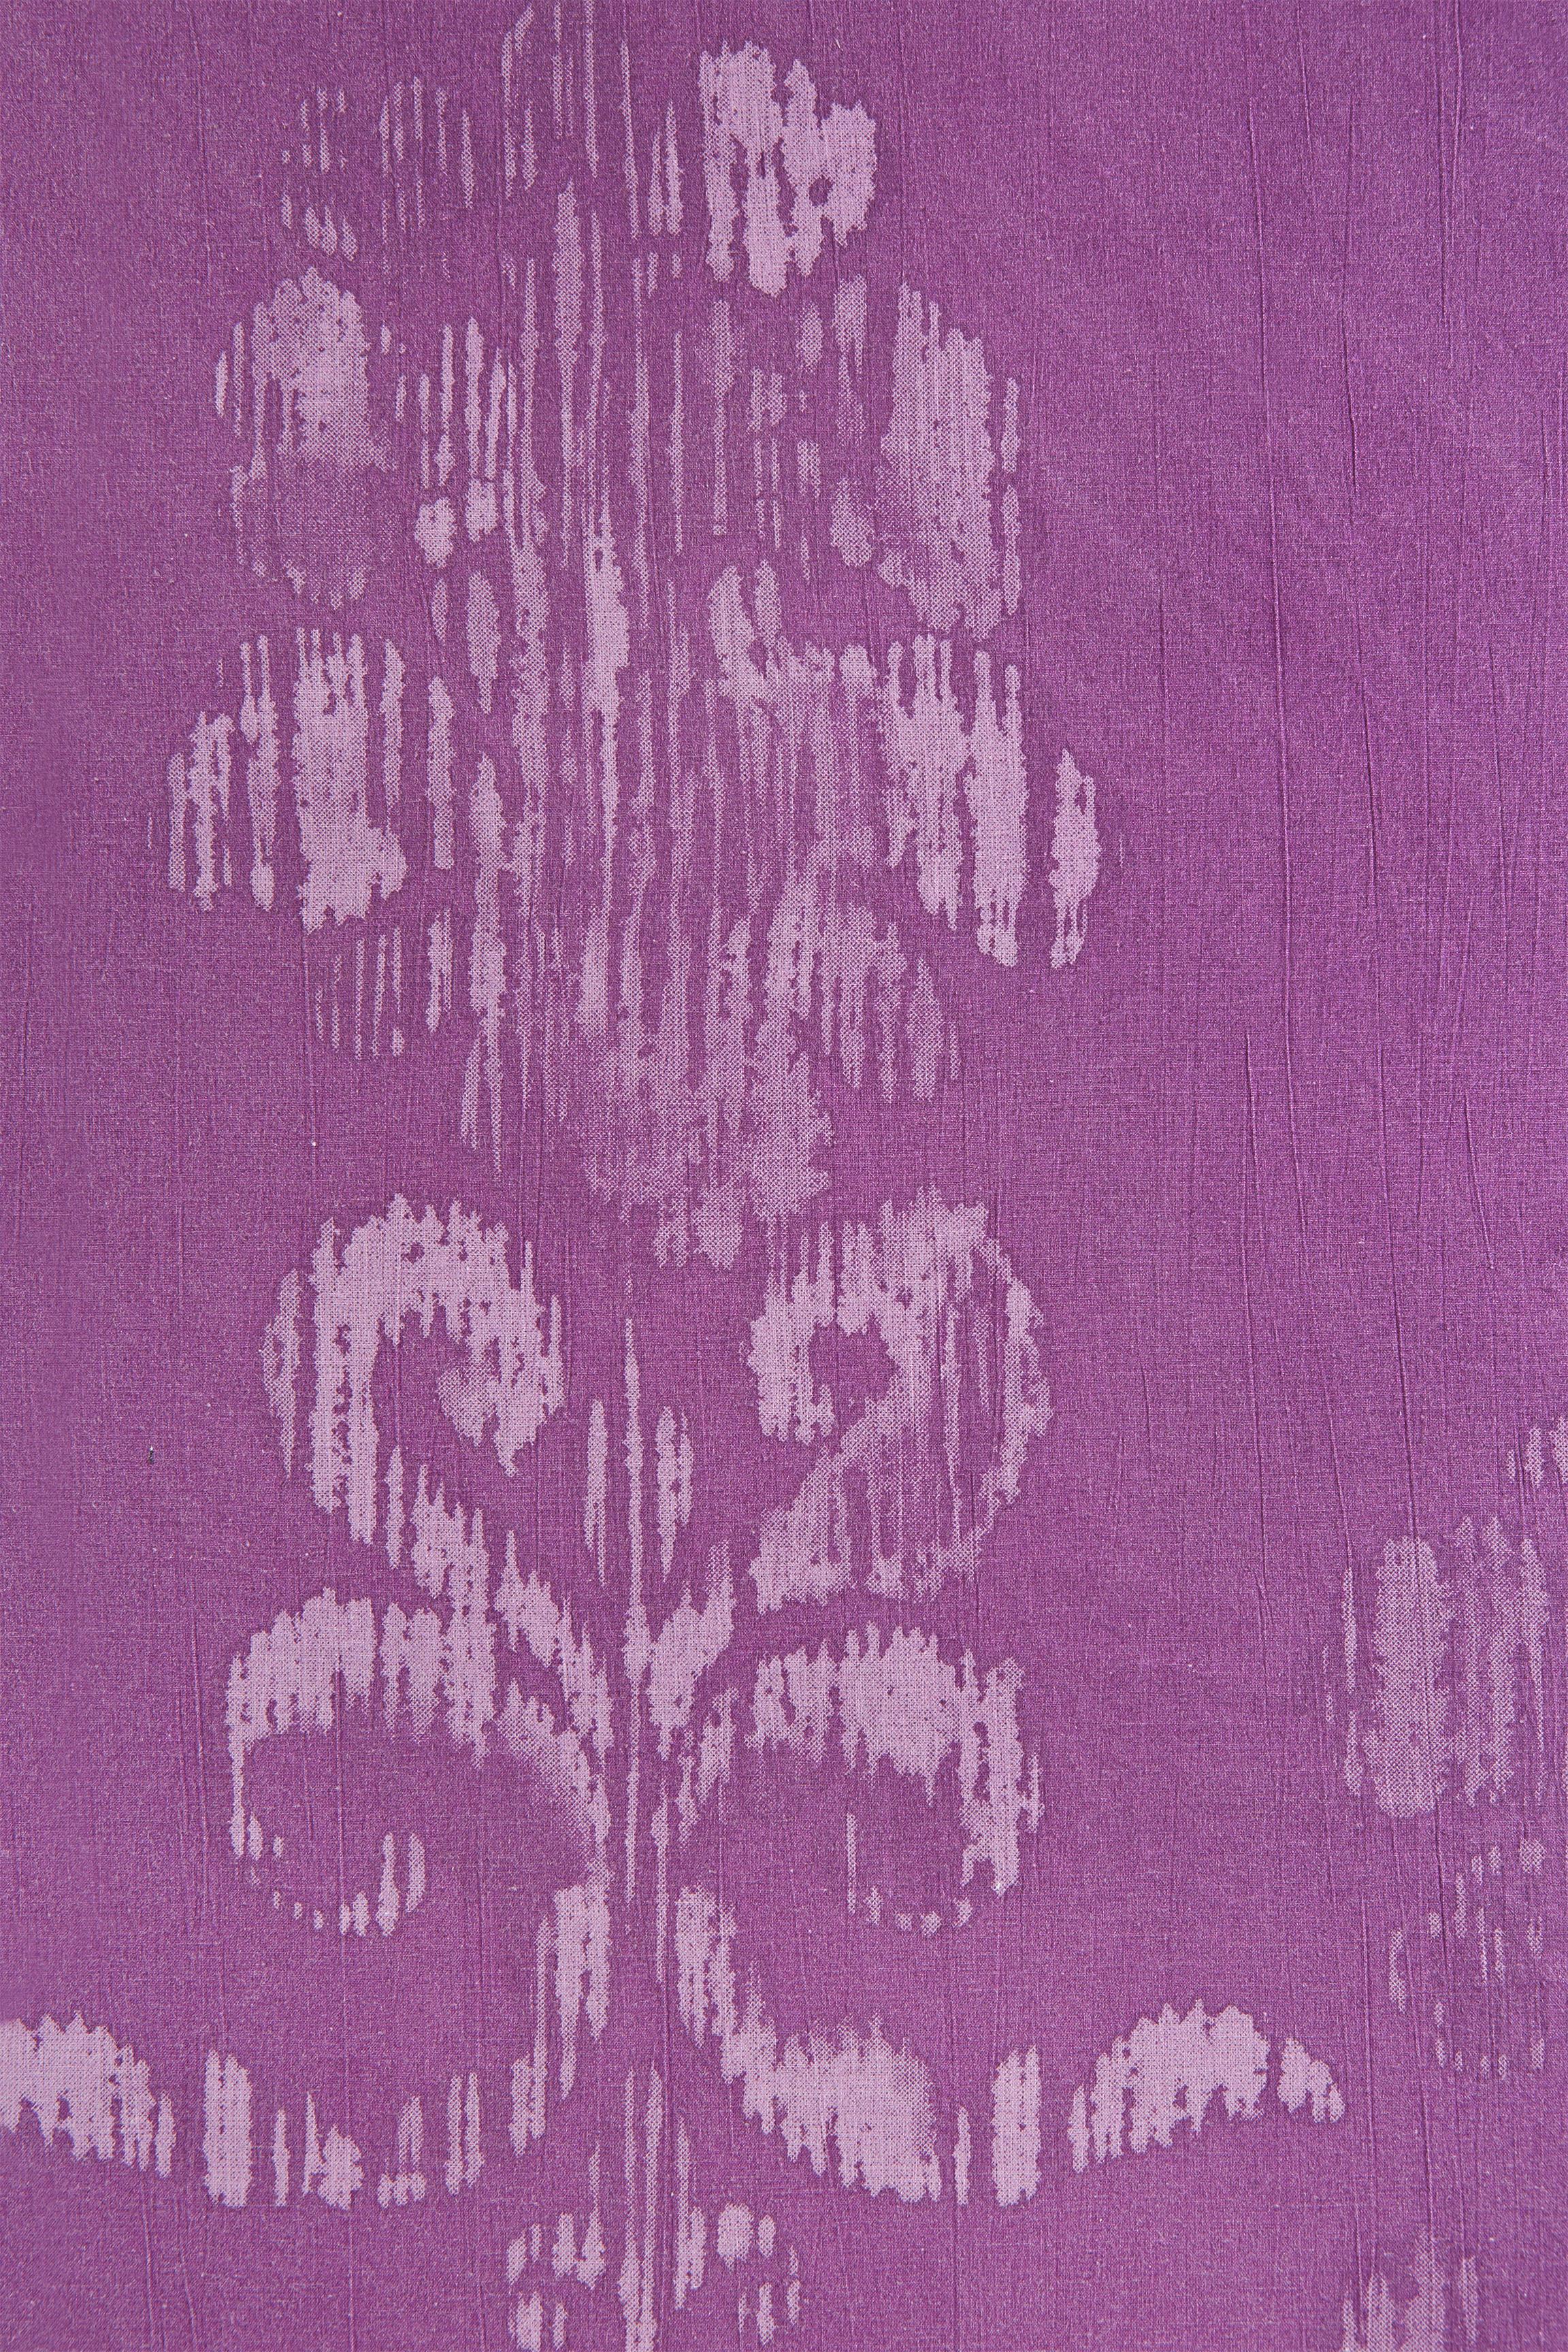 Bettwäsche Lucia in Lila ca. 135x200cm - Lila, ROMANTIK / LANDHAUS, Textil (135/200cm) - MÖMAX modern living